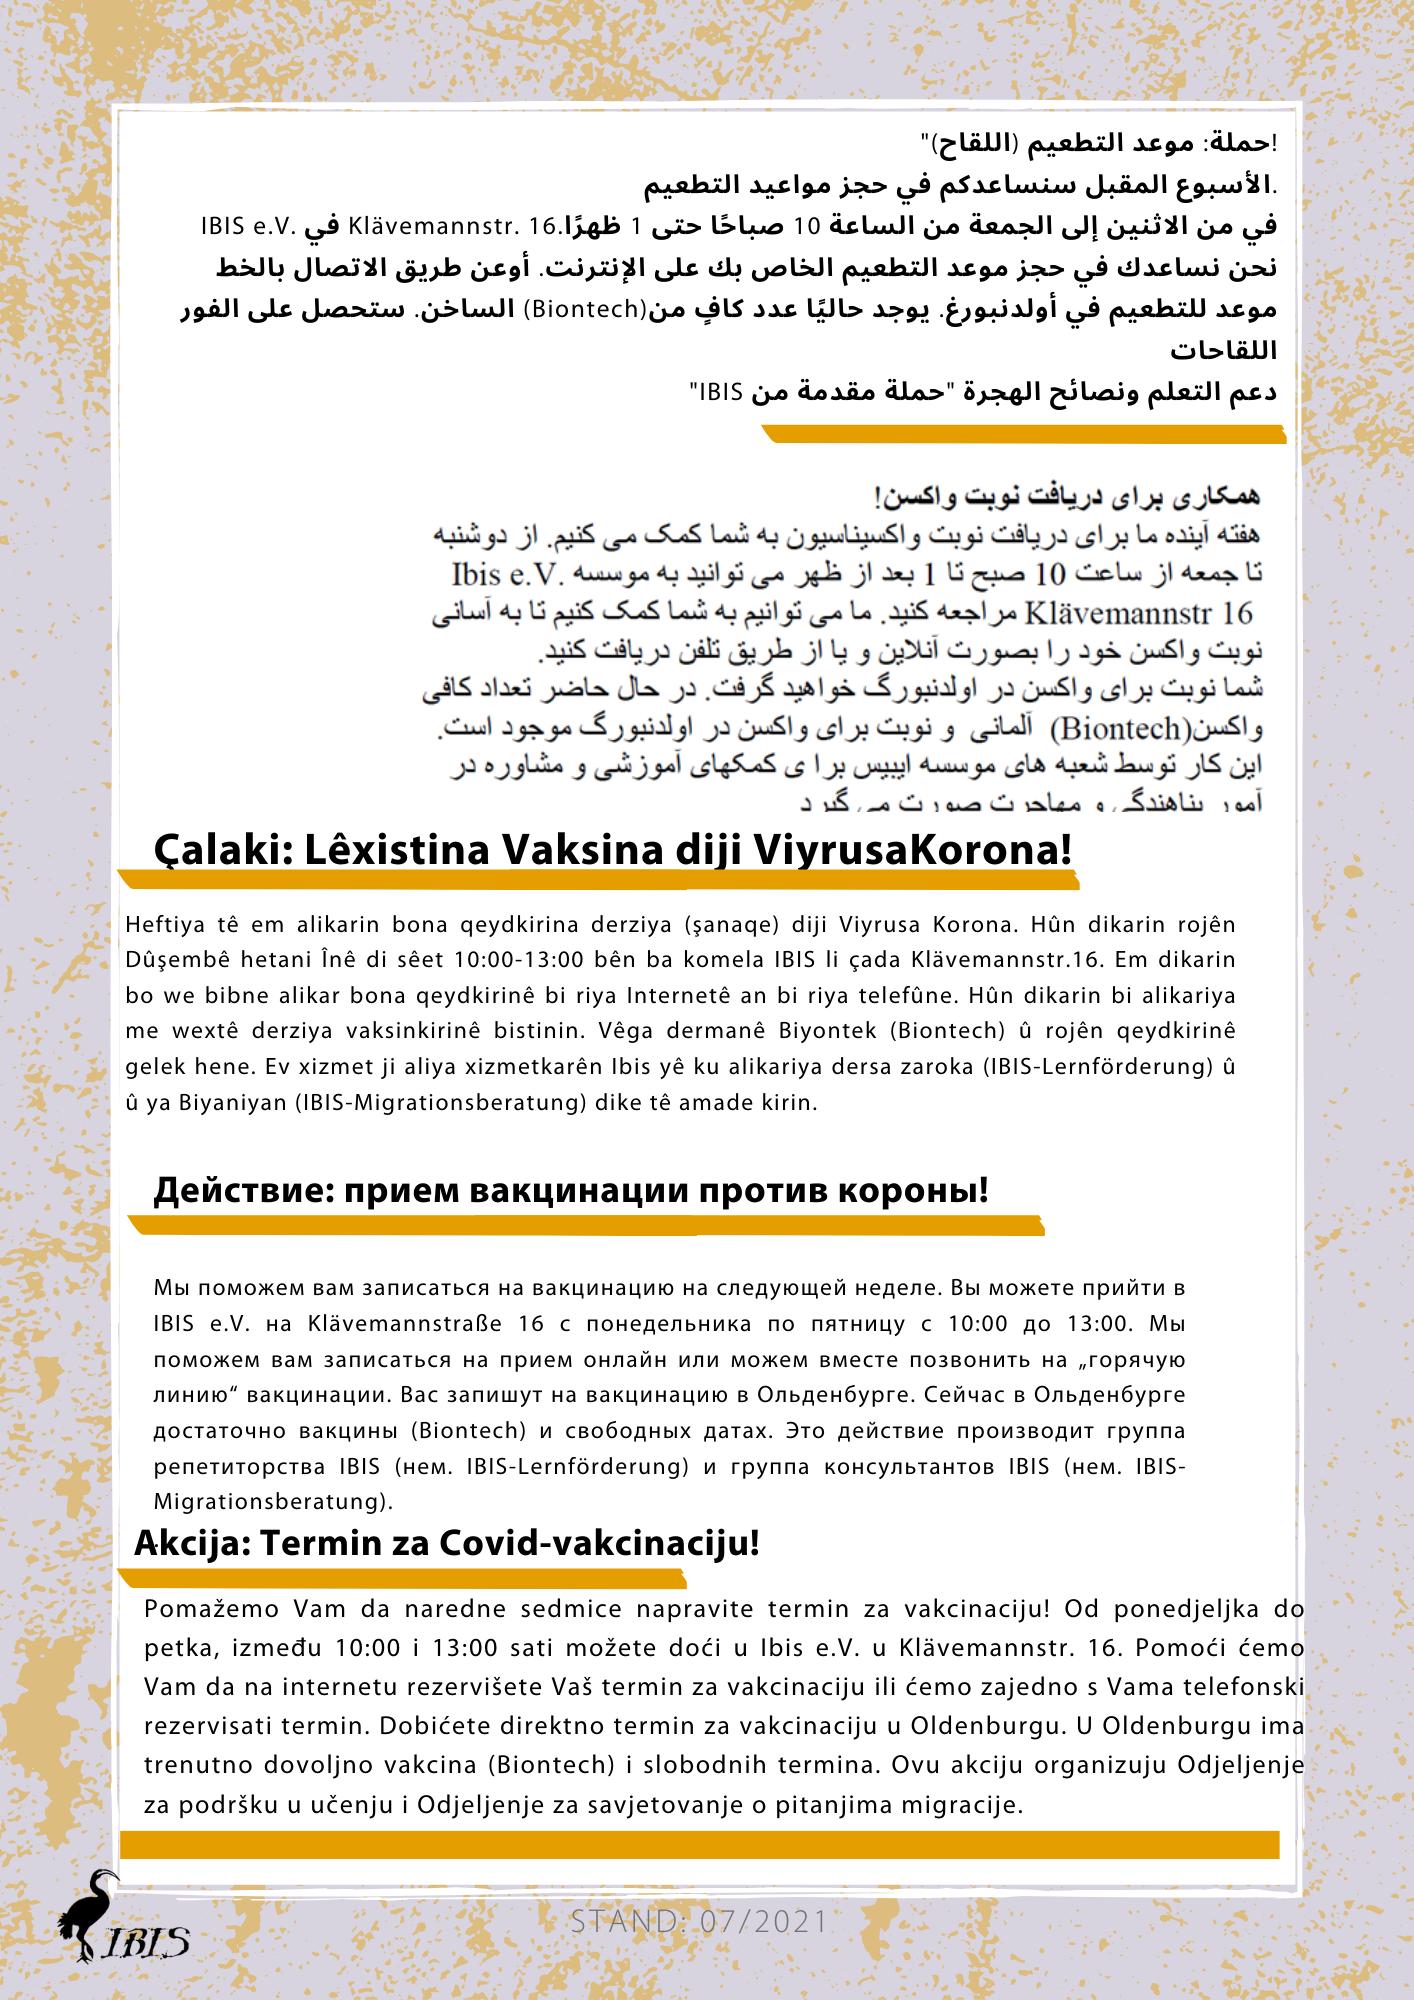 Aktion Impftermin_Post Arabisch Farsi usw